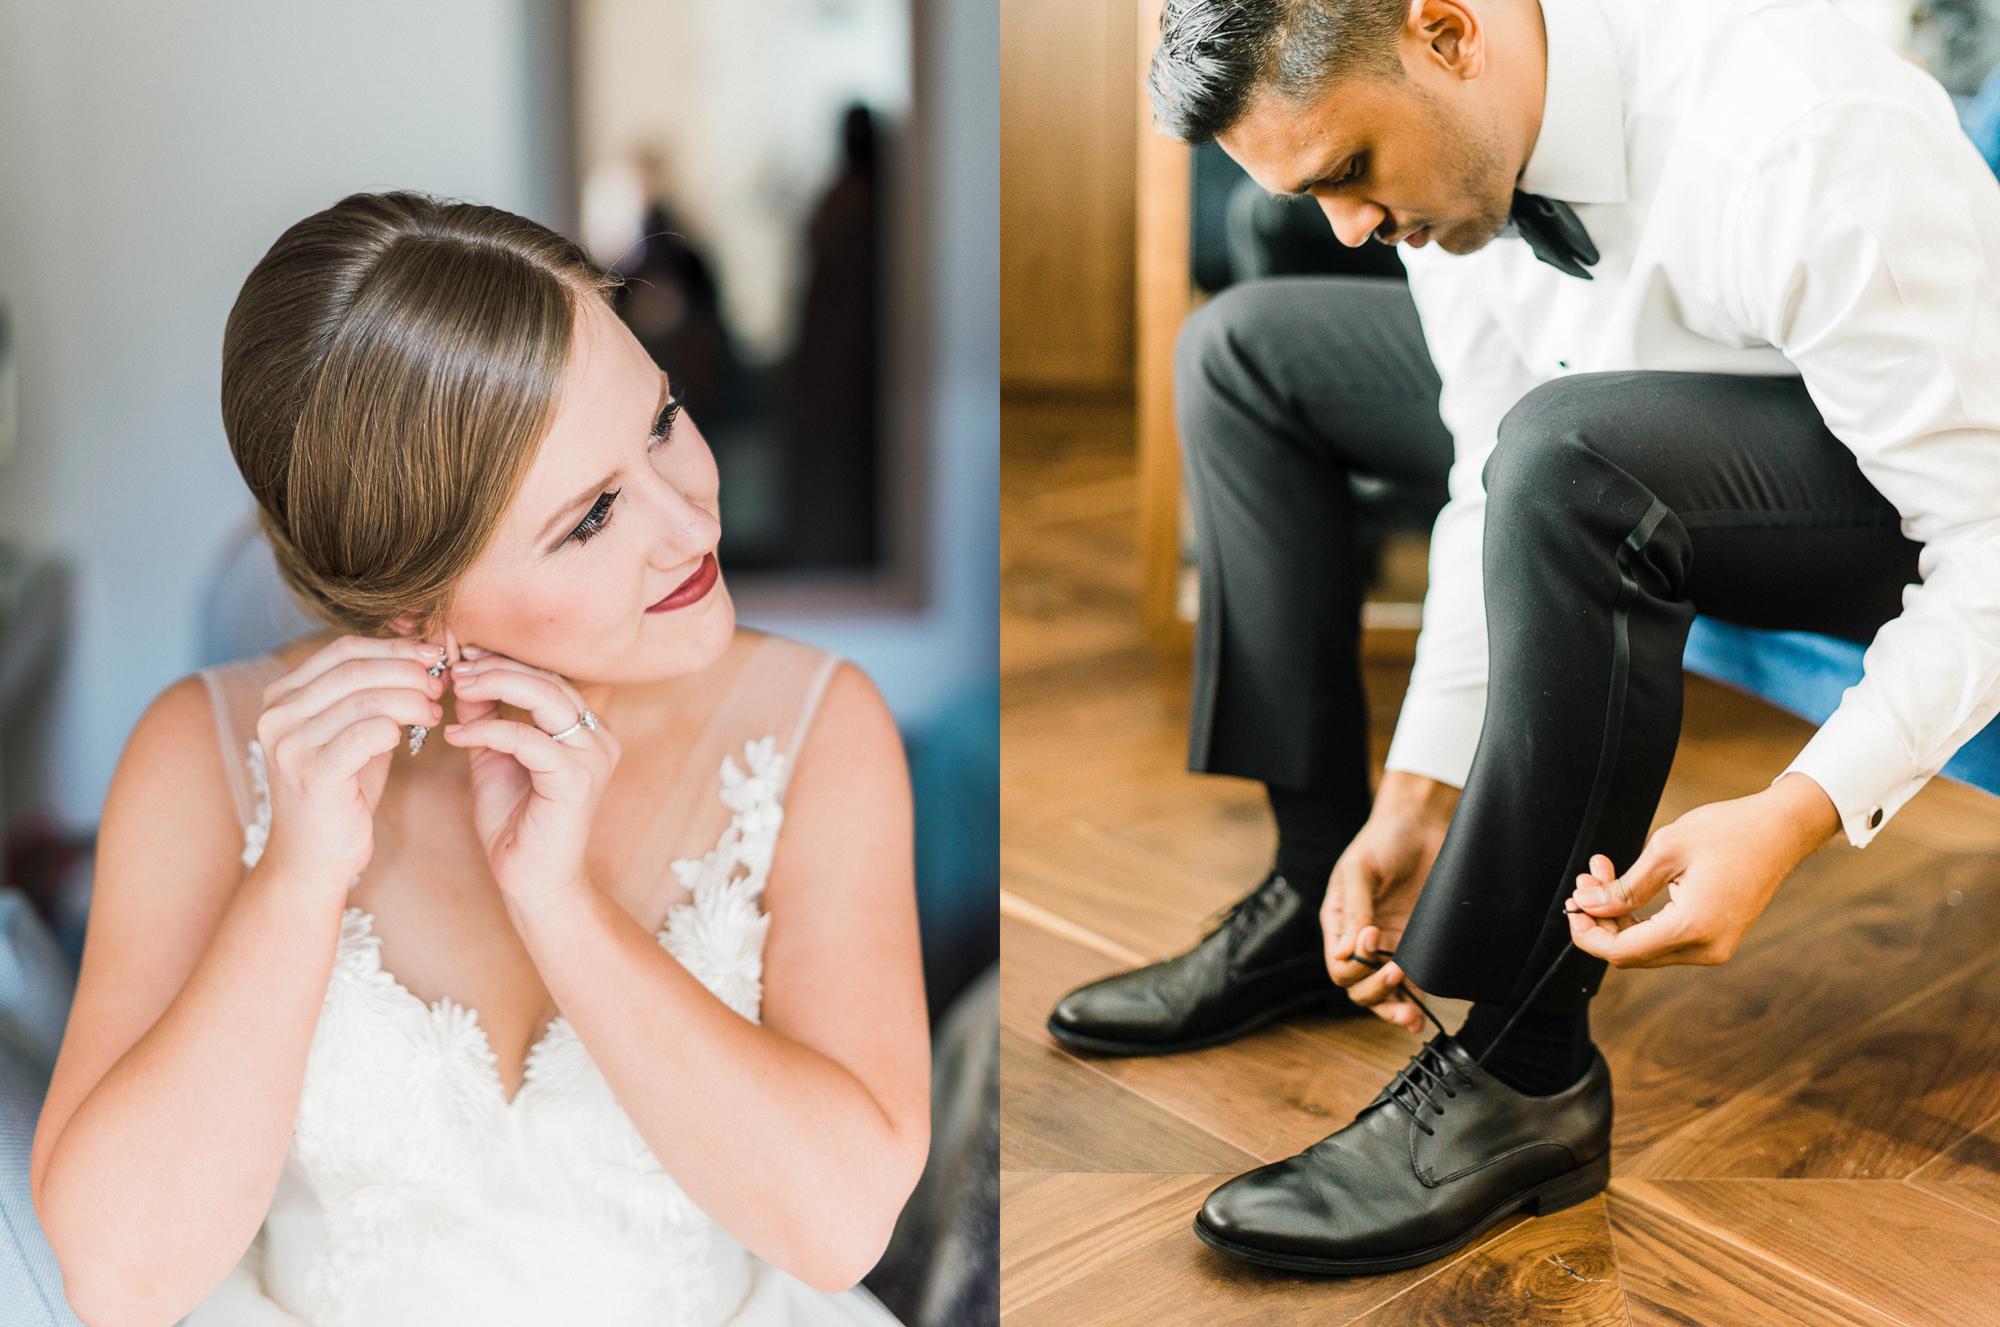 betsy-hotel-wedding-south-beach-miami-charleston-south-carolina-destination-wedding-photographer-4.jpg